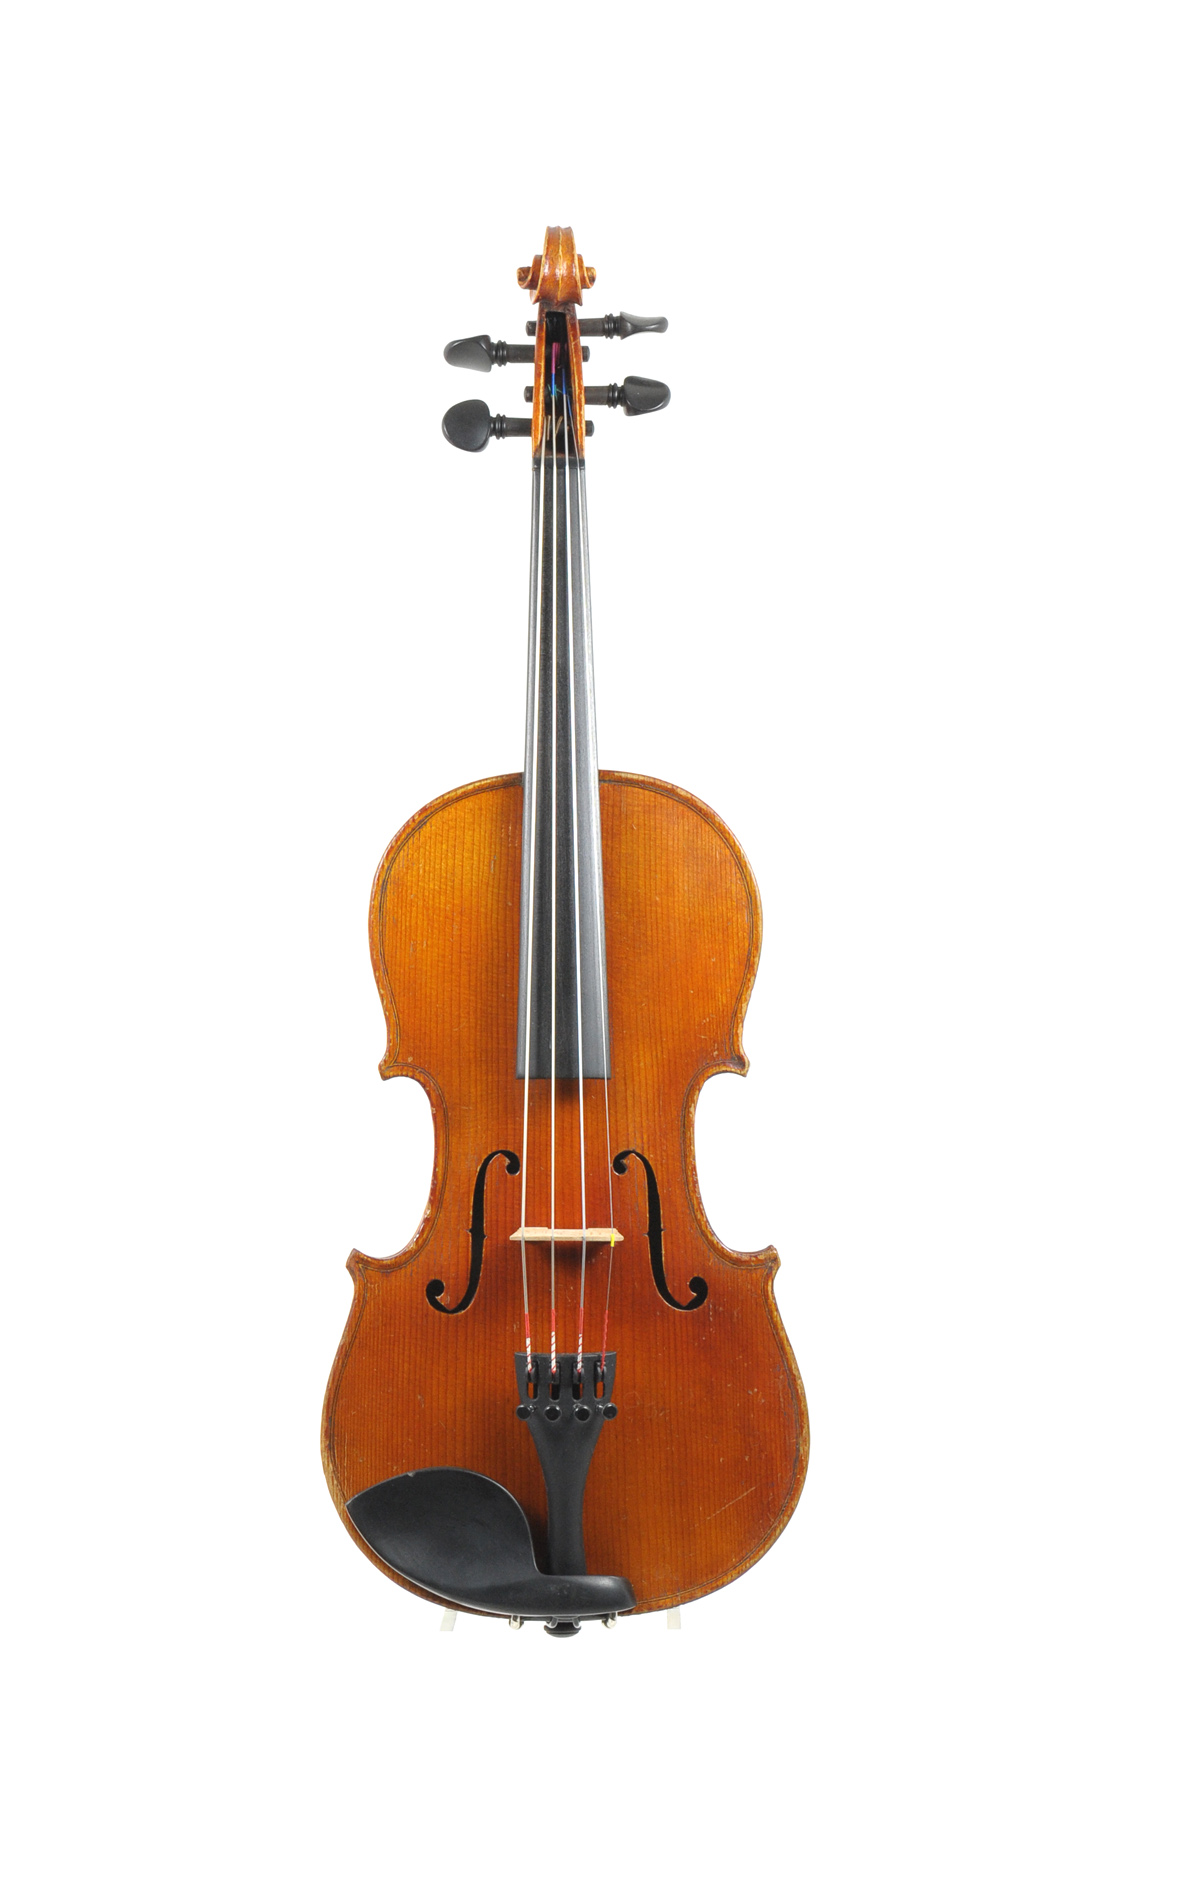 1 8 rare french 1 8 violin approx 1850 children 39 s. Black Bedroom Furniture Sets. Home Design Ideas